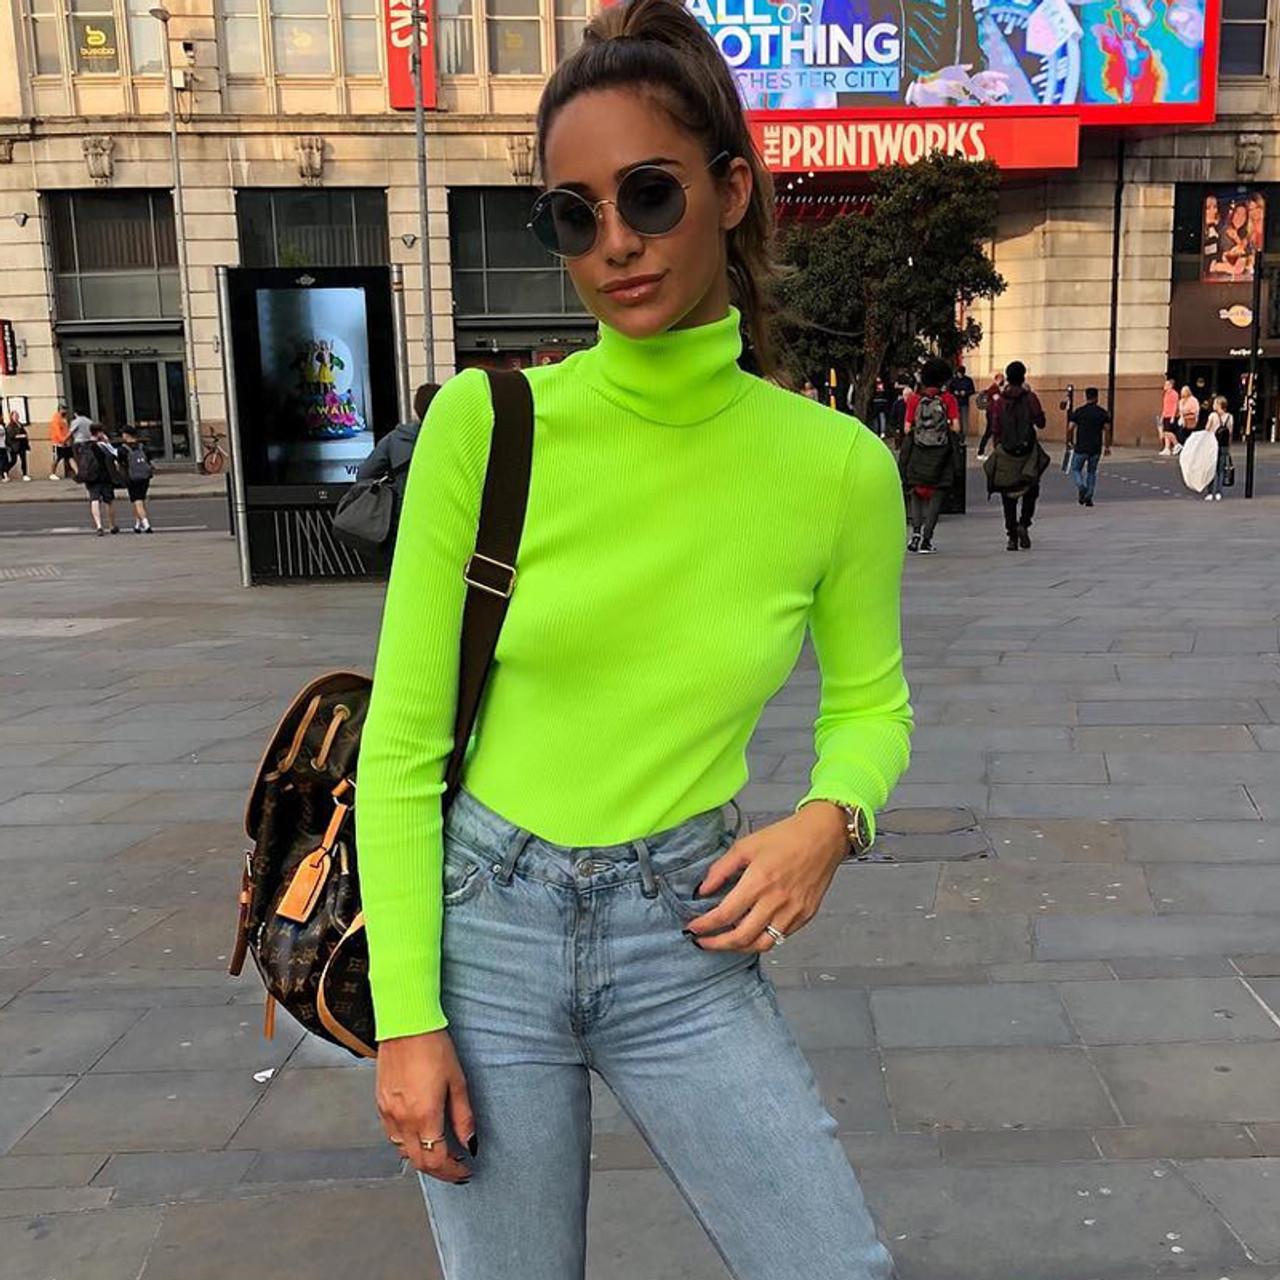 Long Sleeve Neon High Neck Bodycon Green Solid Tops 2018 Autumn